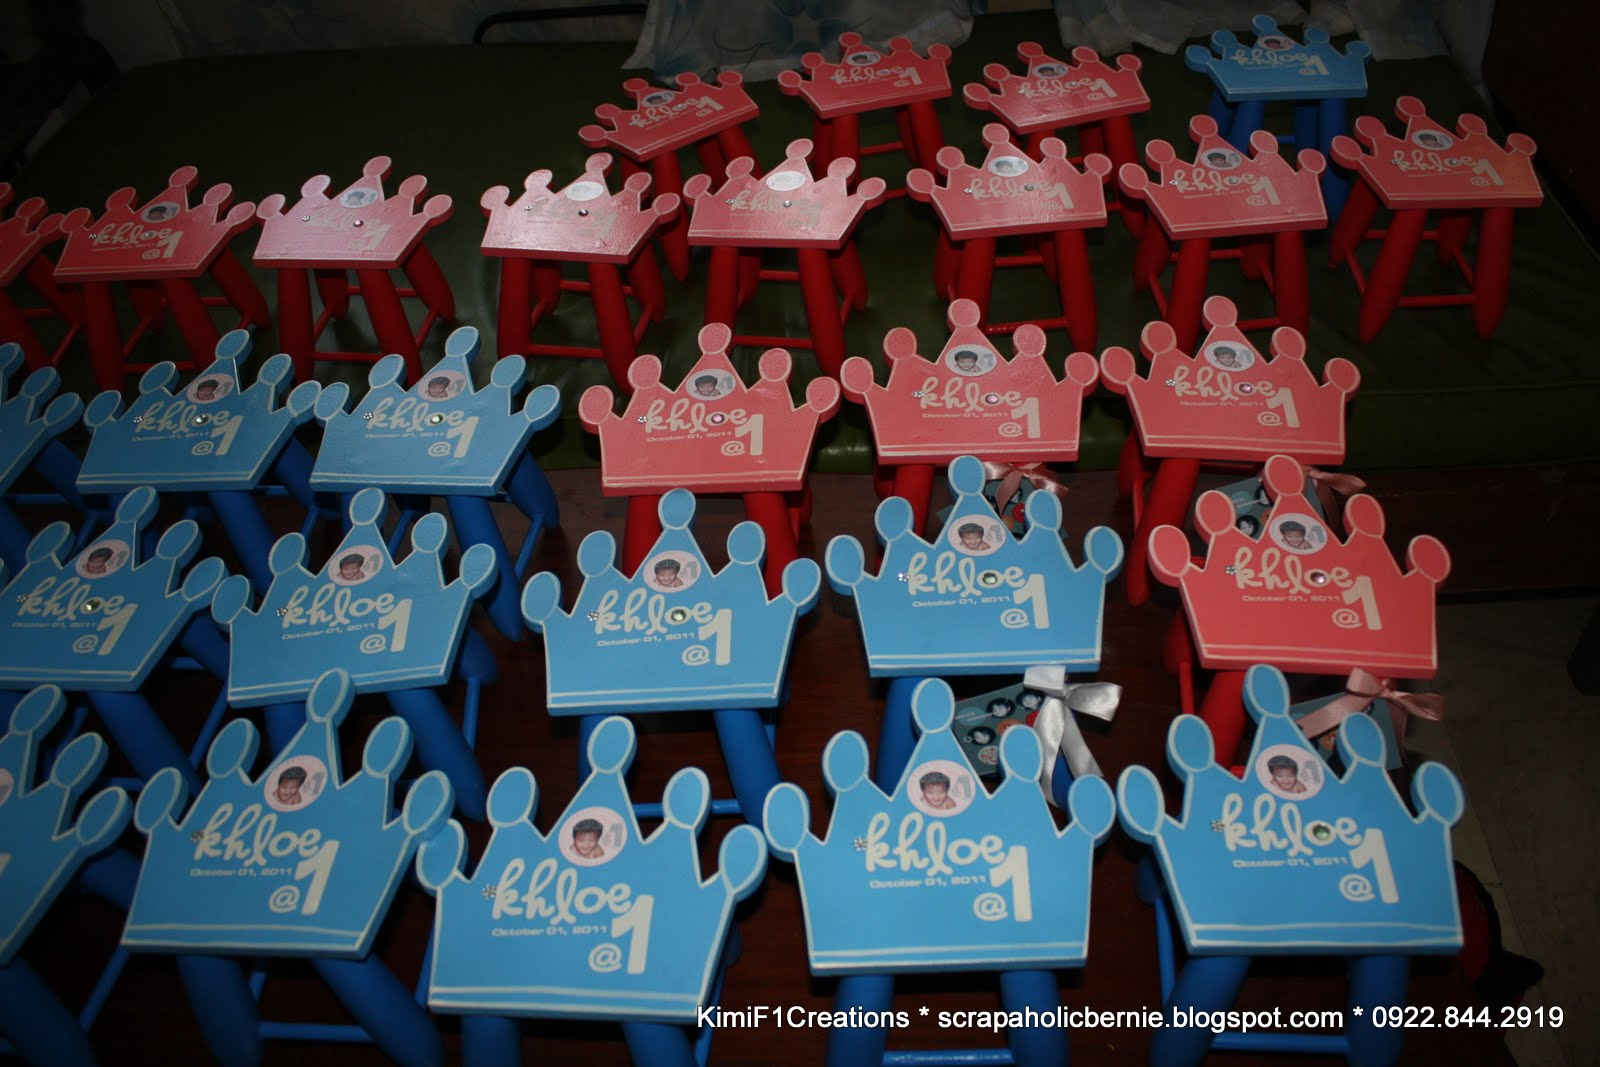 F1 Digital Scrapaholic Khloe S Birthday Giveaway By Handicrafts Atbp